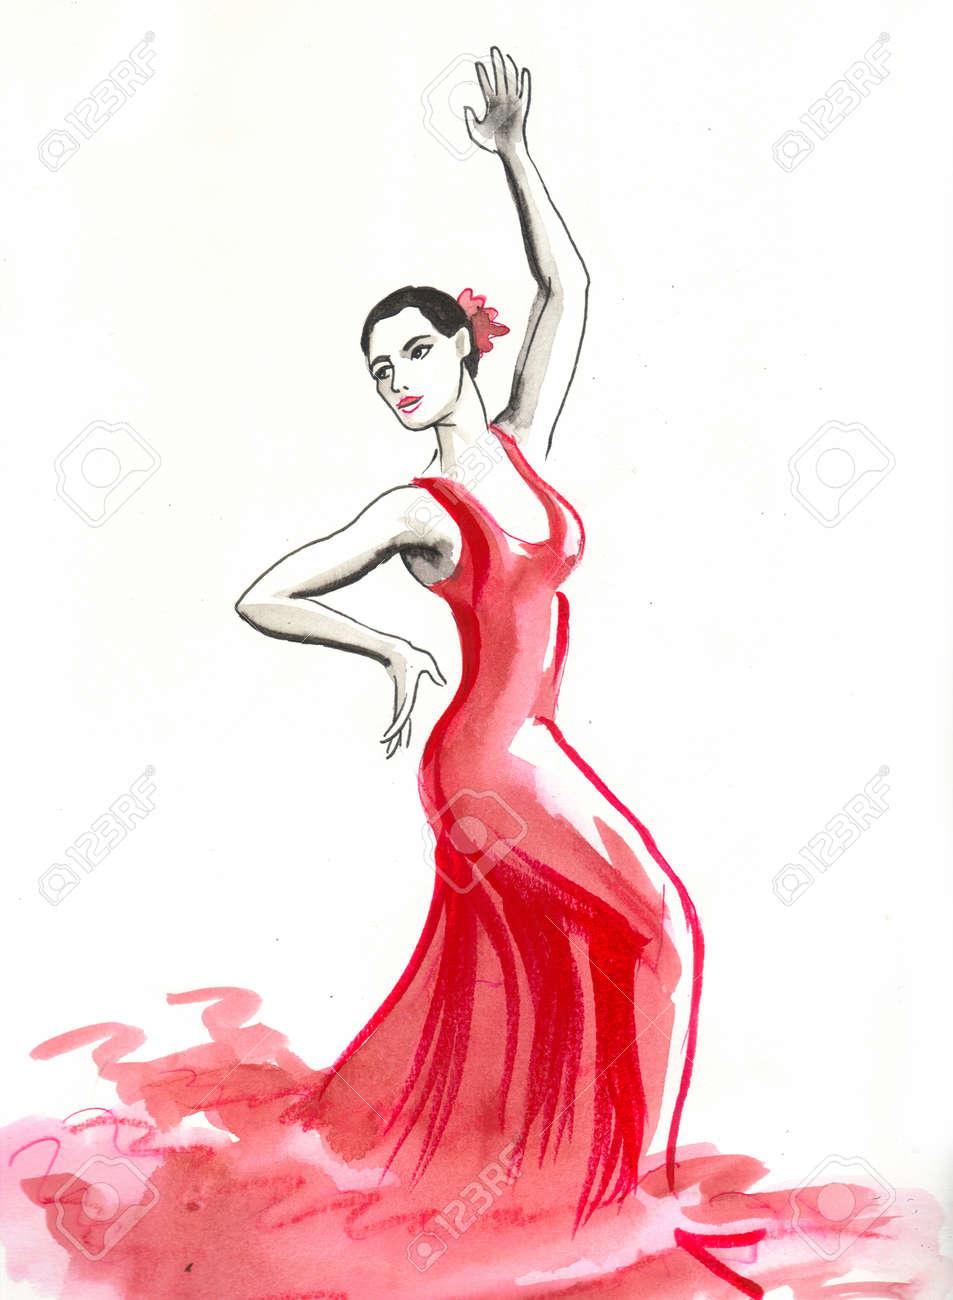 Beautiful Spanish woman dancing flamenco - 134771778